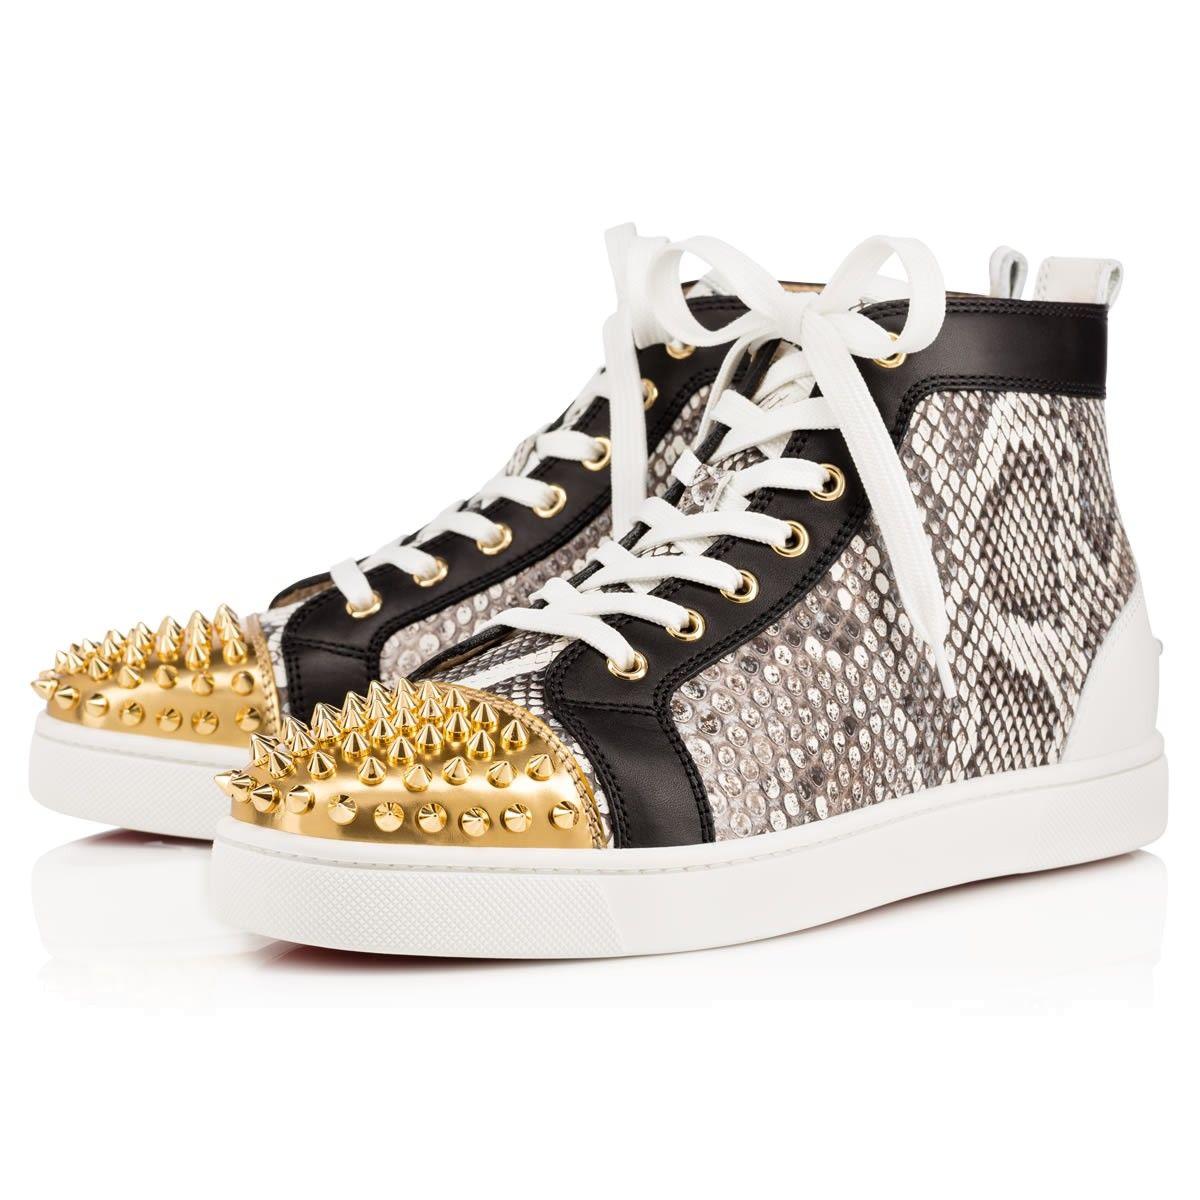 Shoes Lou Spikes Men S Flat Christian Louboutin Hynek Herren Mode Mode Und Herrin